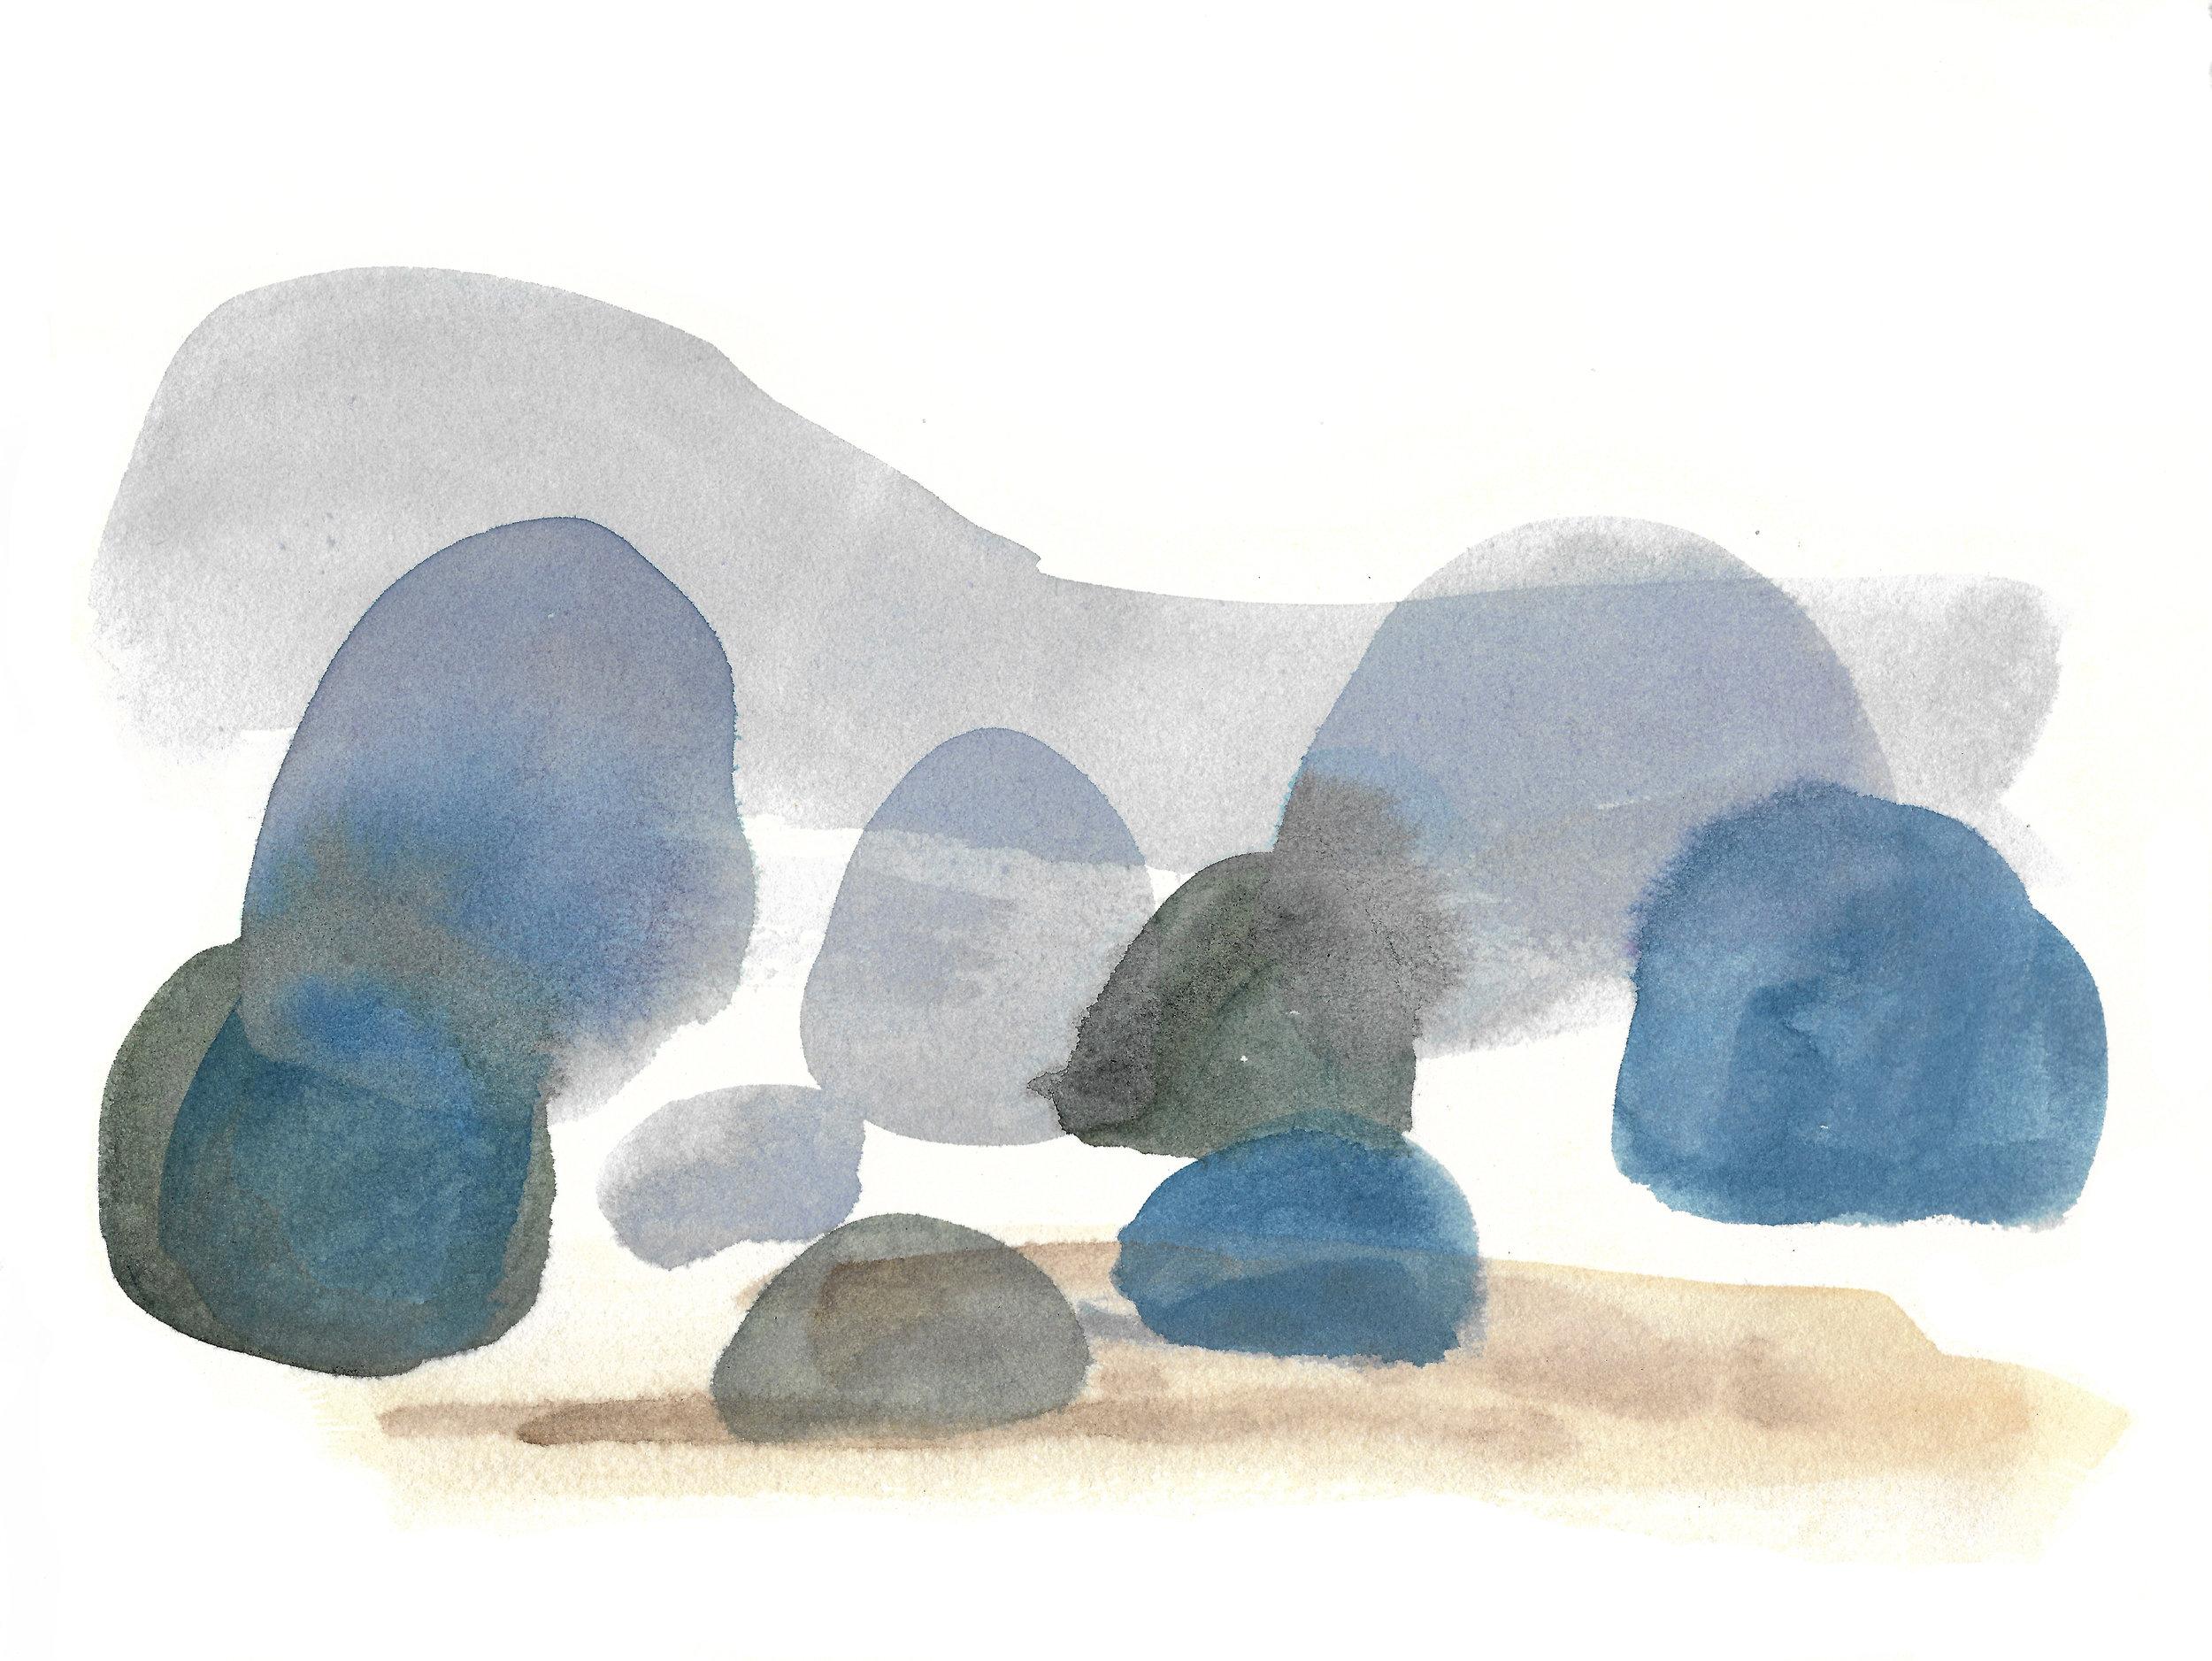 bluerocklandscape.jpg